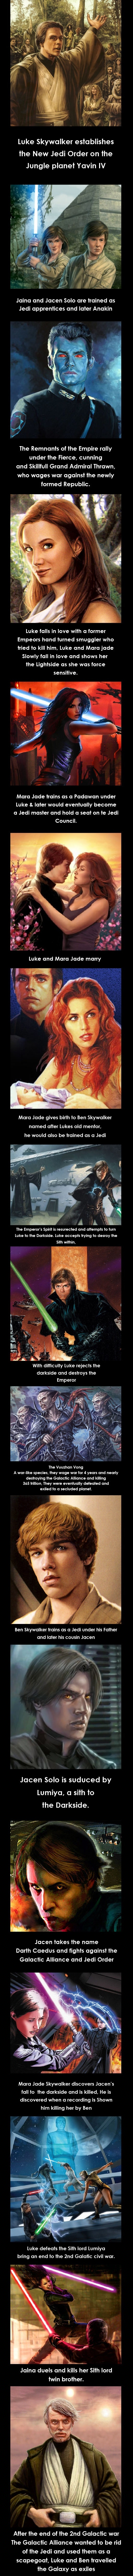 Star Wars History: Skywalker Family